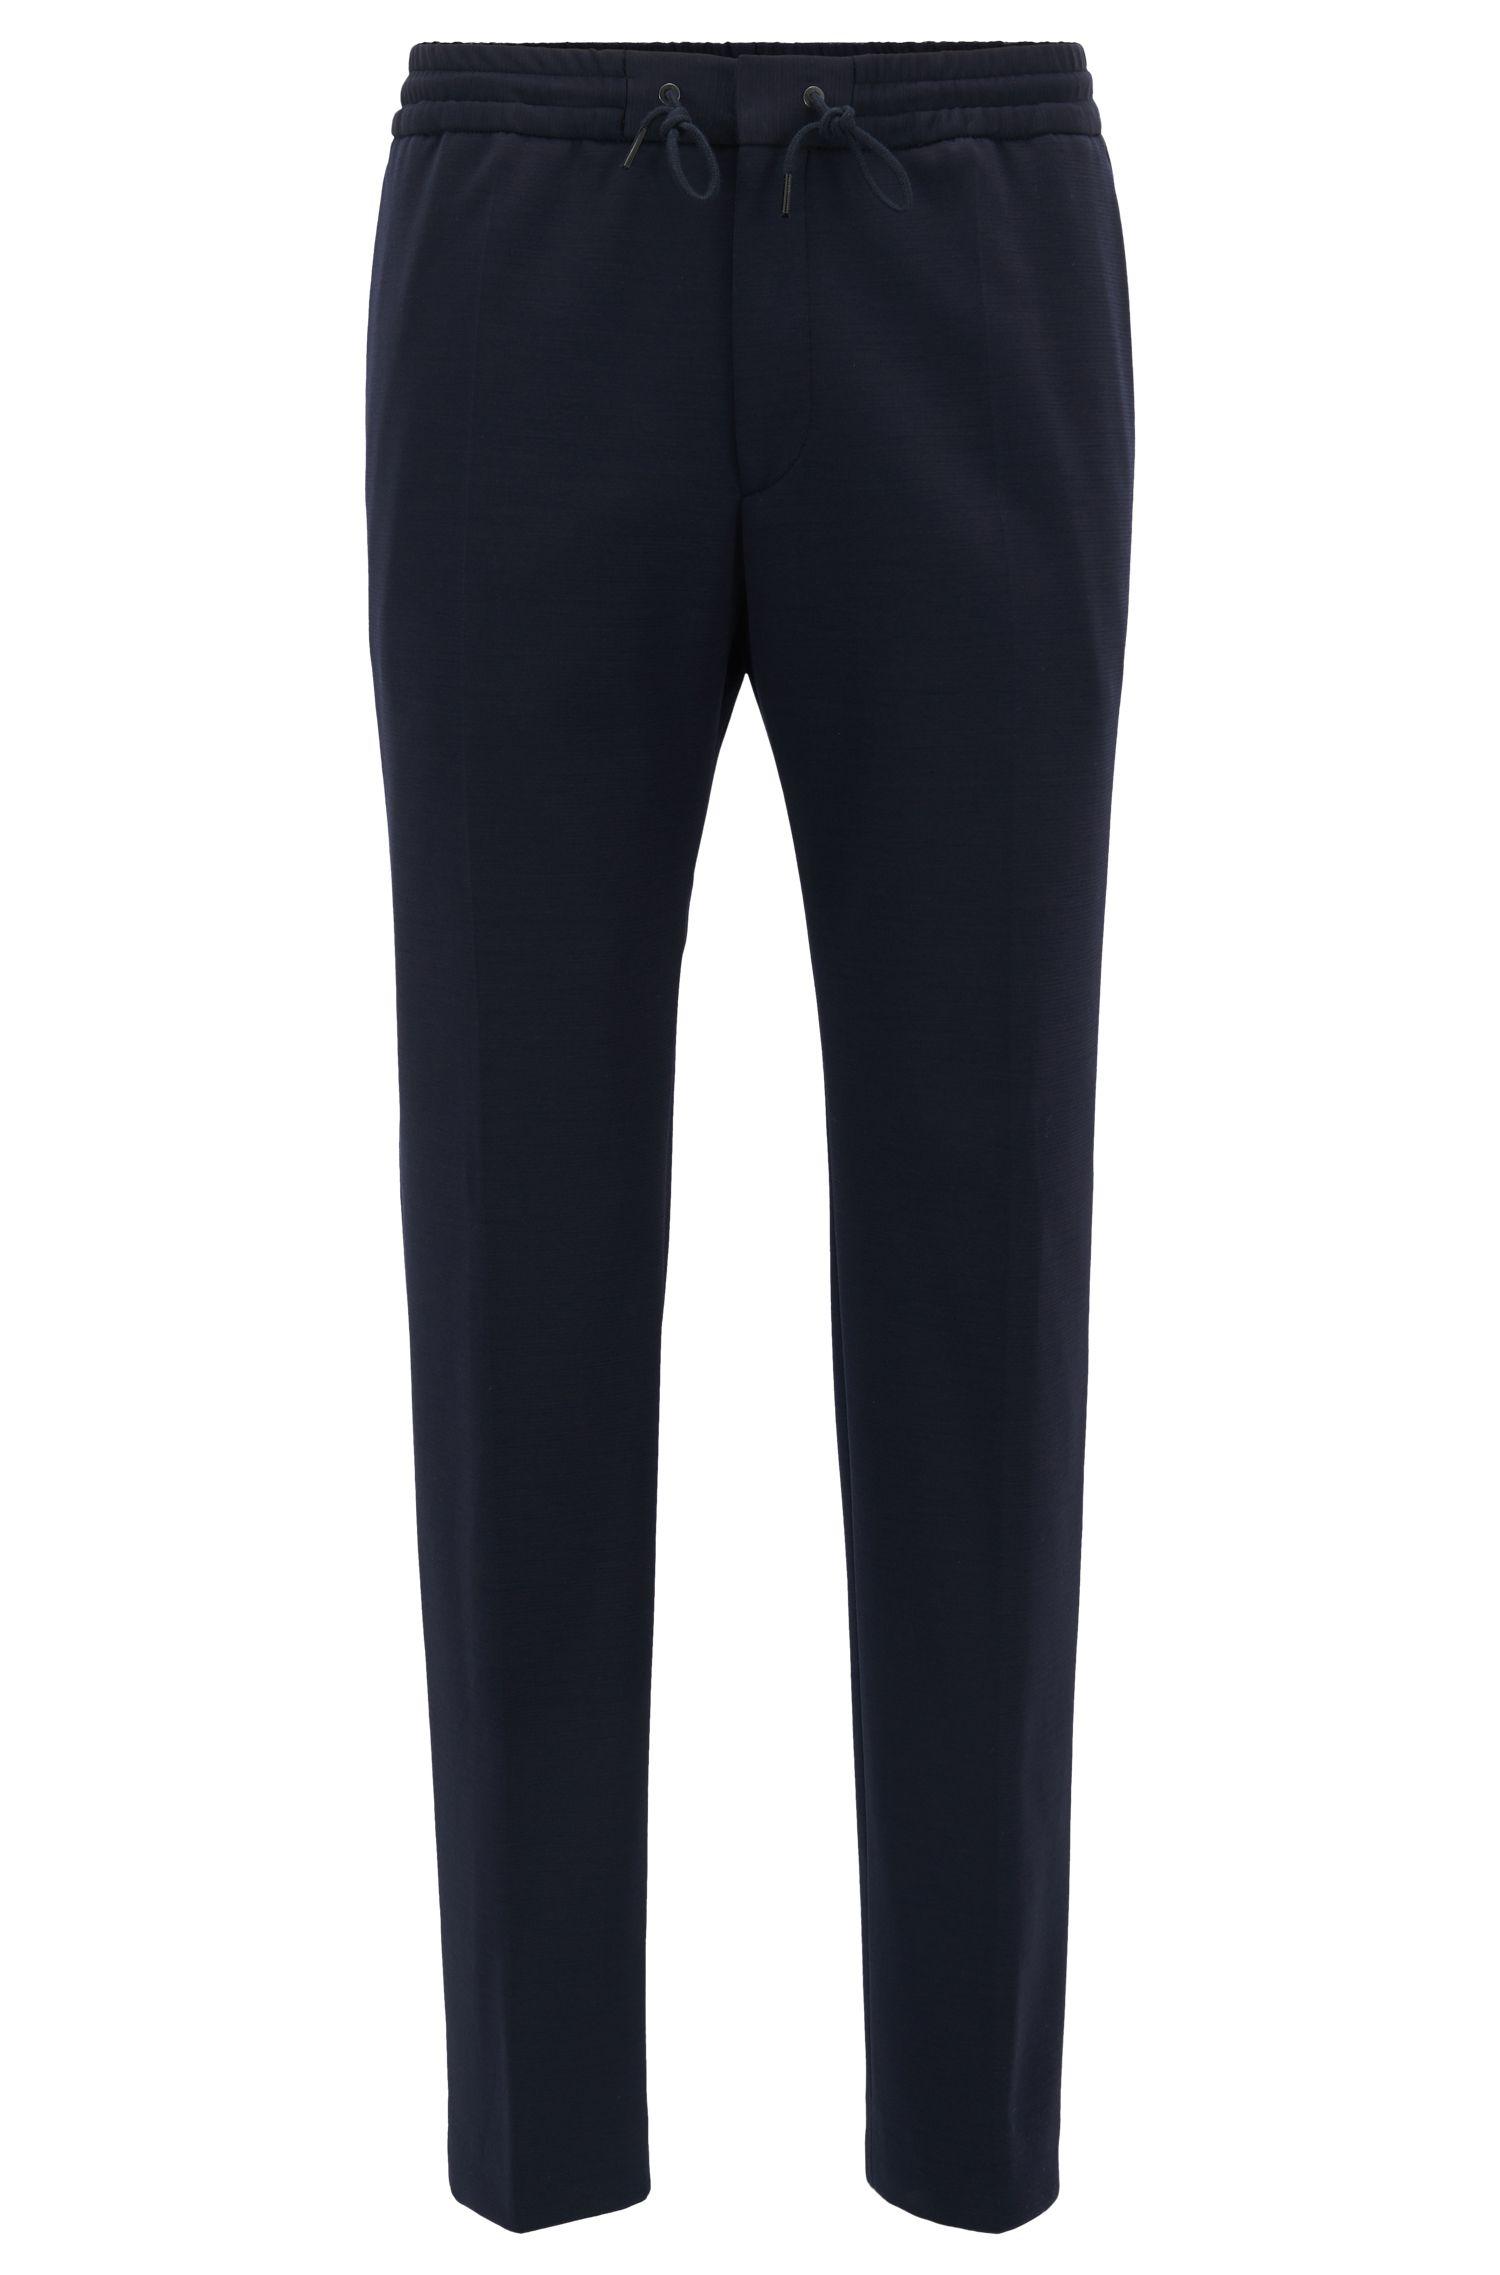 Pantaloni con cordoncino slim fit in misto lana vergine